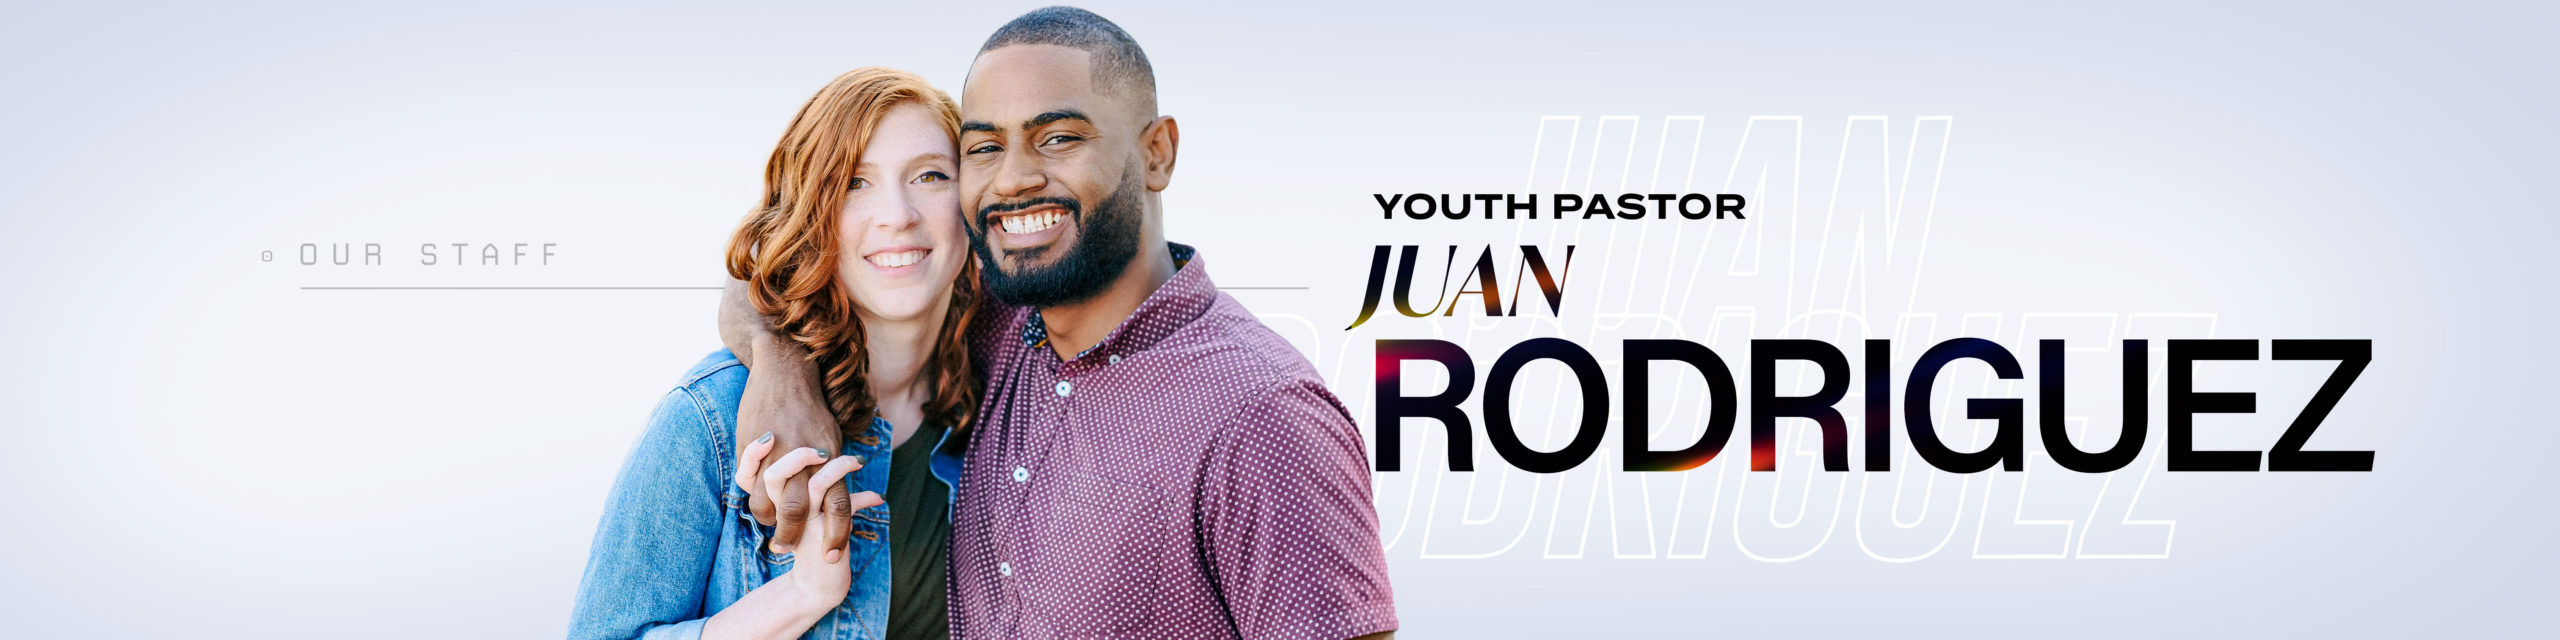 Youth Pastor Juan Rodriguez